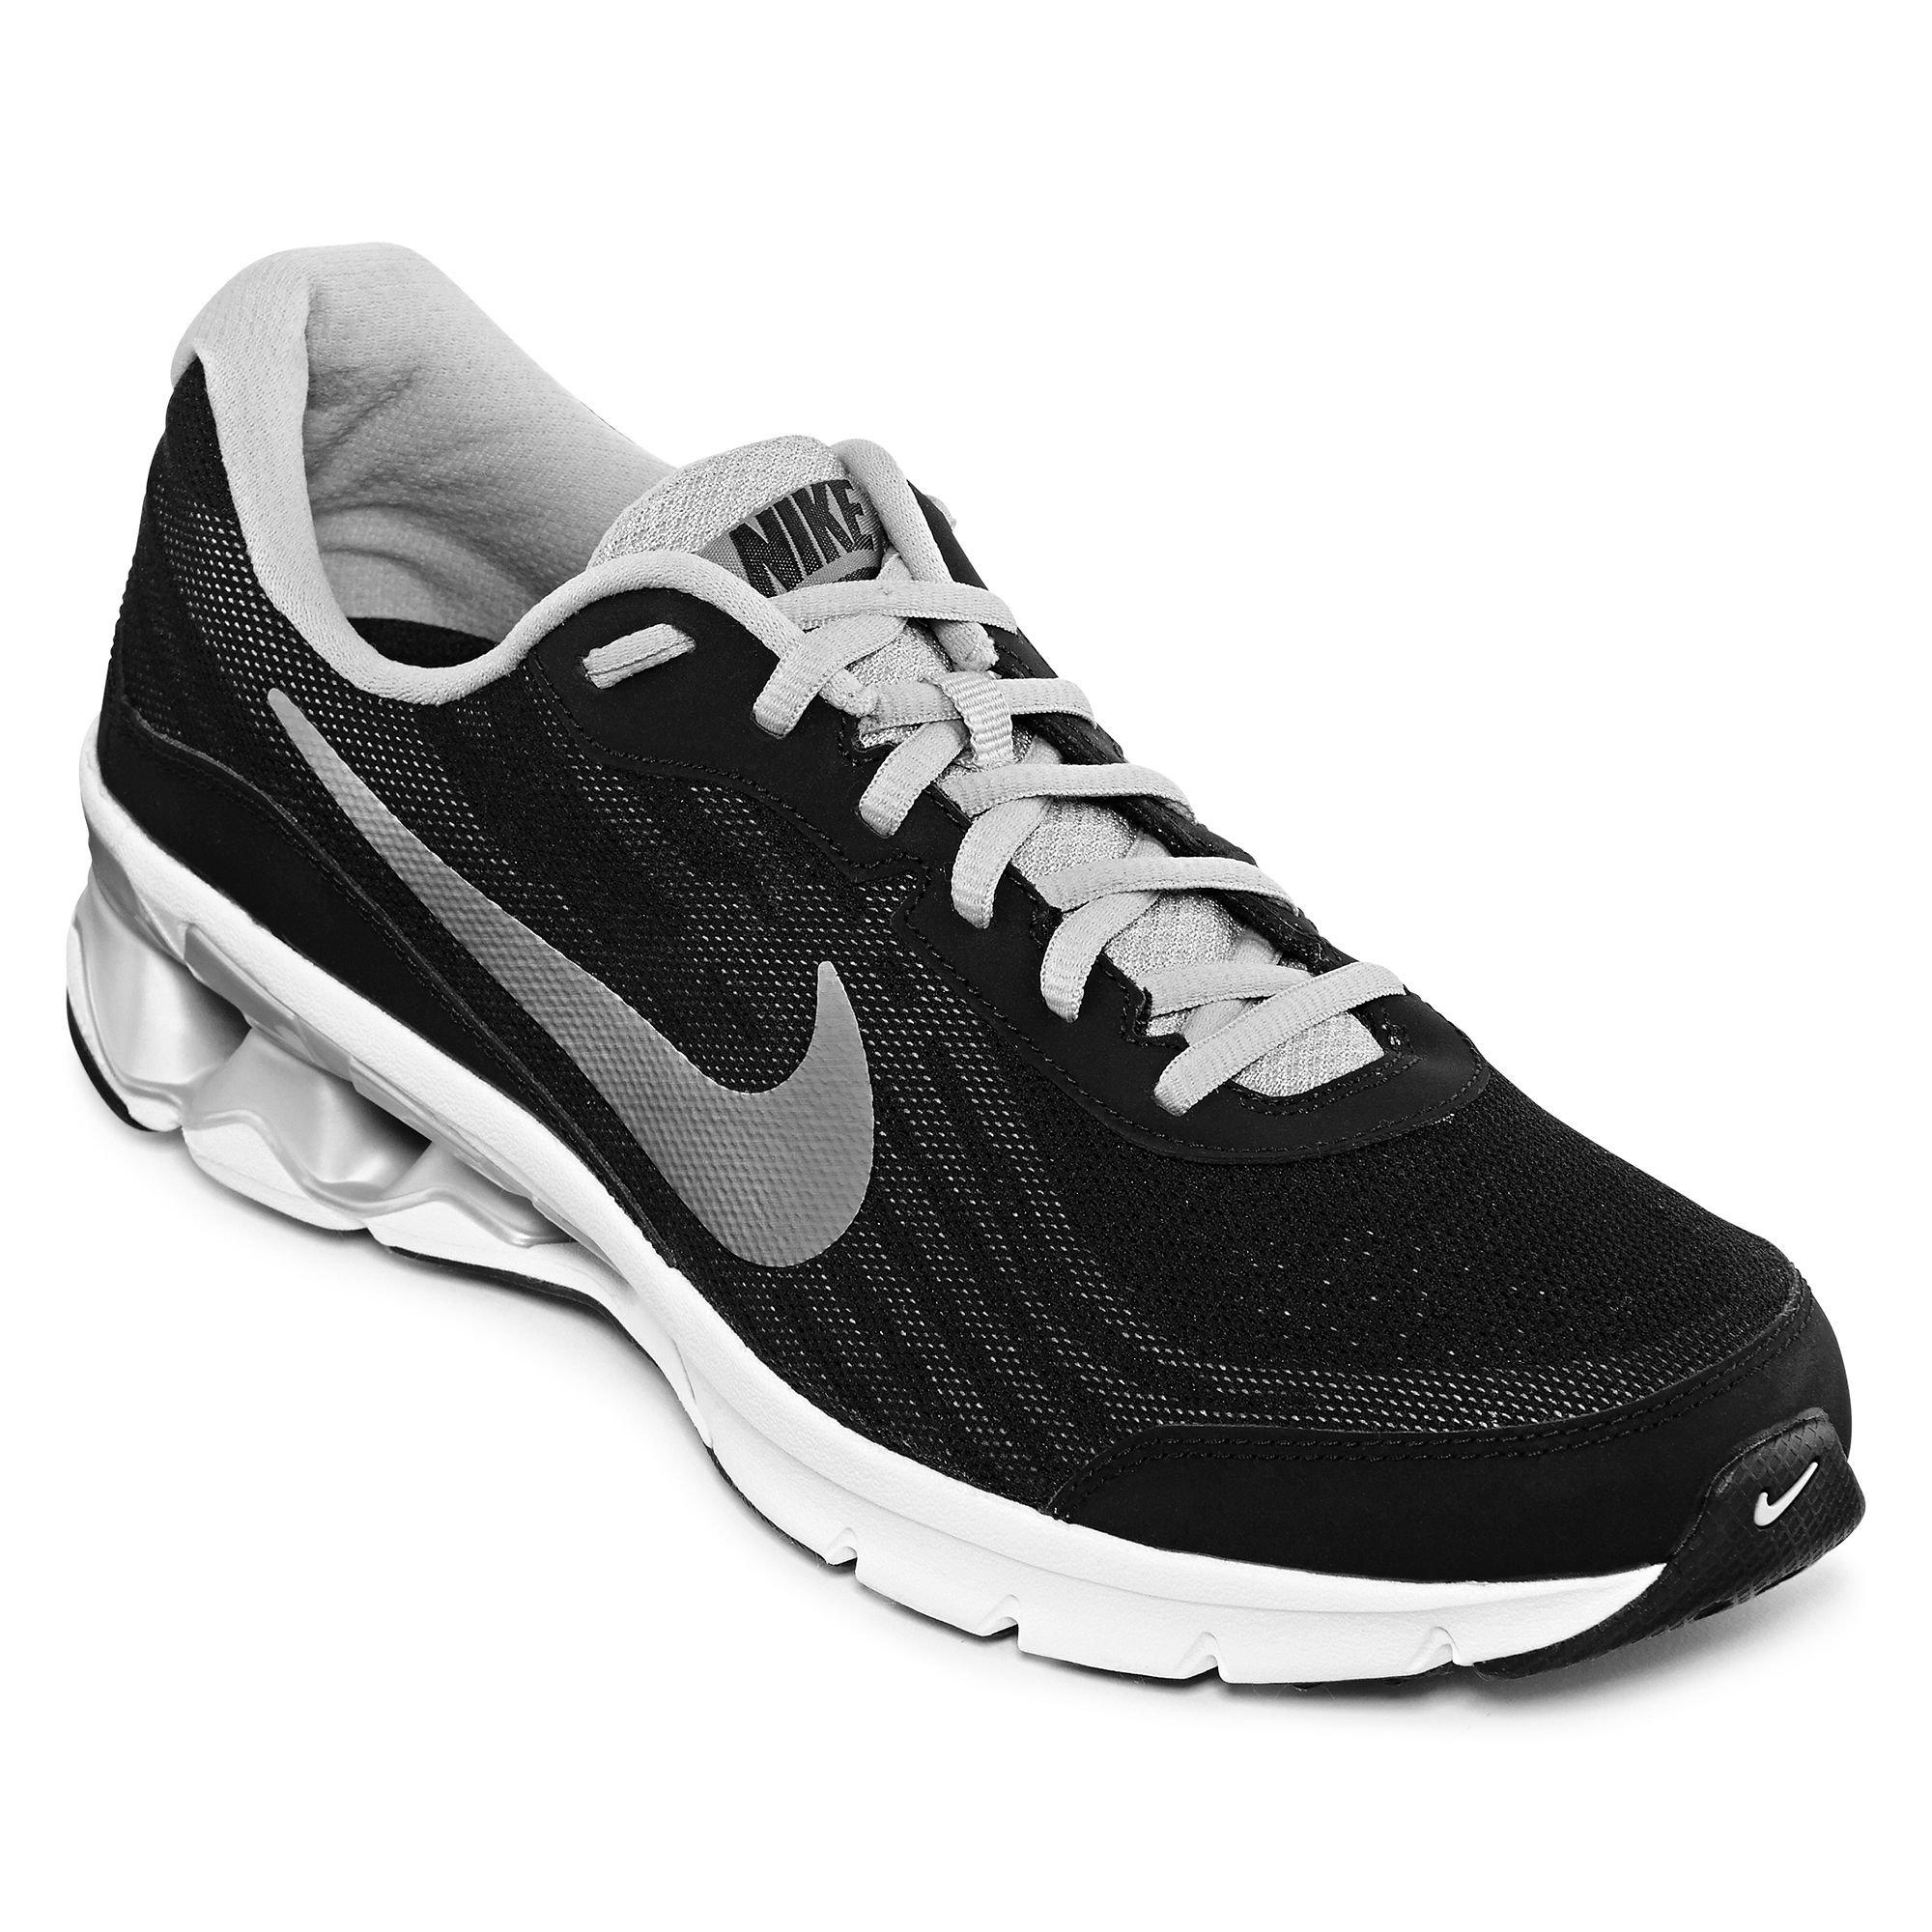 Nike Men's Reax Run 9 Black/Metallic Silver/Dark Grey/Whi...